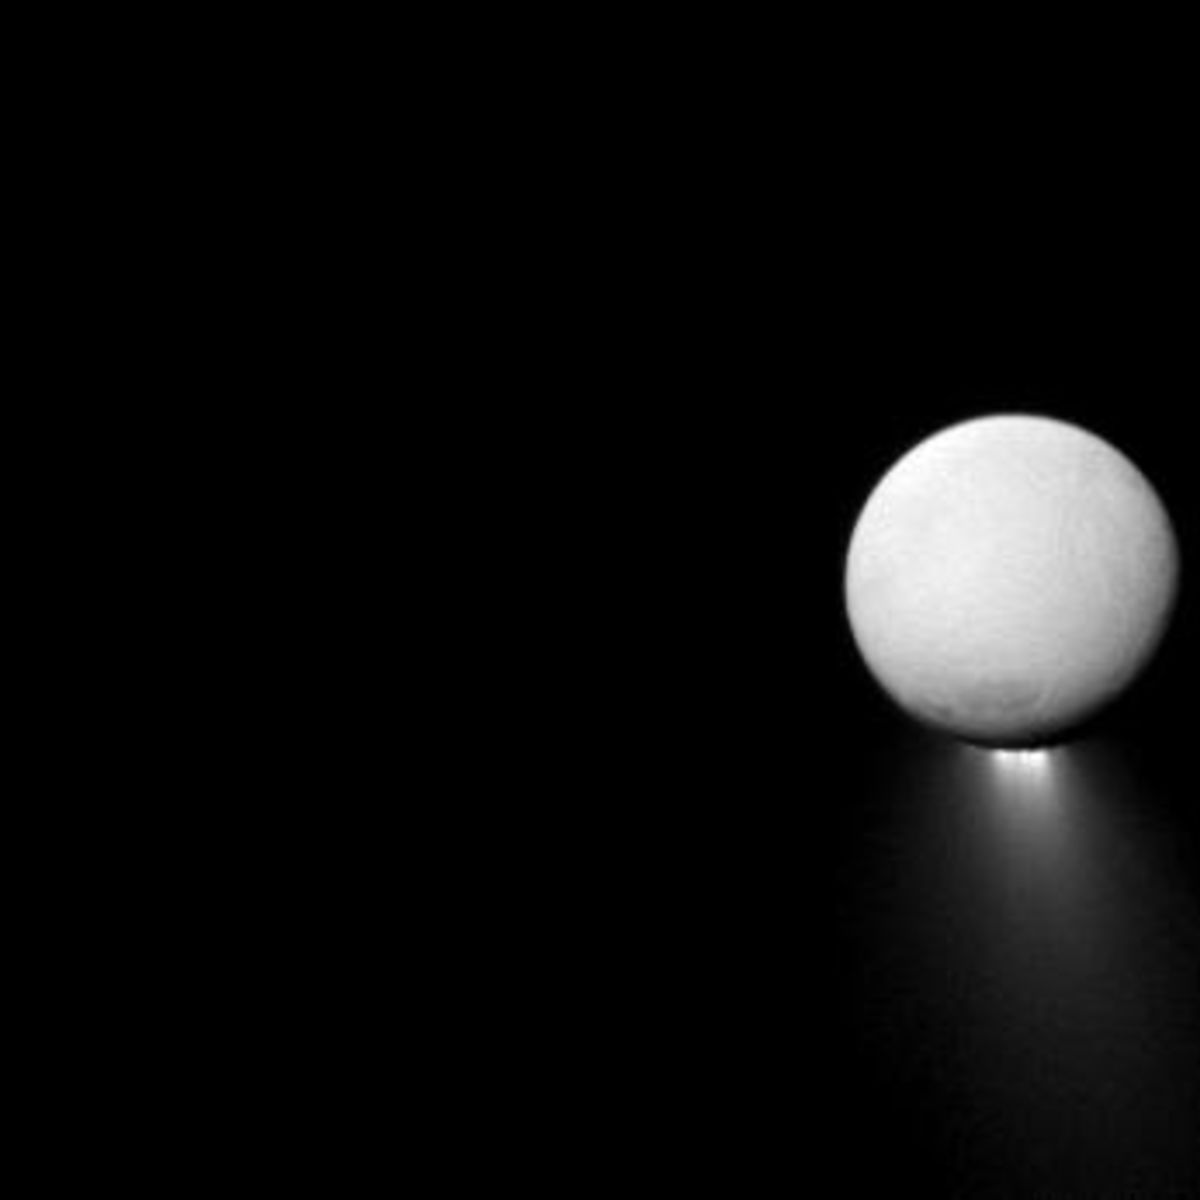 cassini_enceladus_geysers_apr2013.jpg.CROP.rectangle-large.jpg